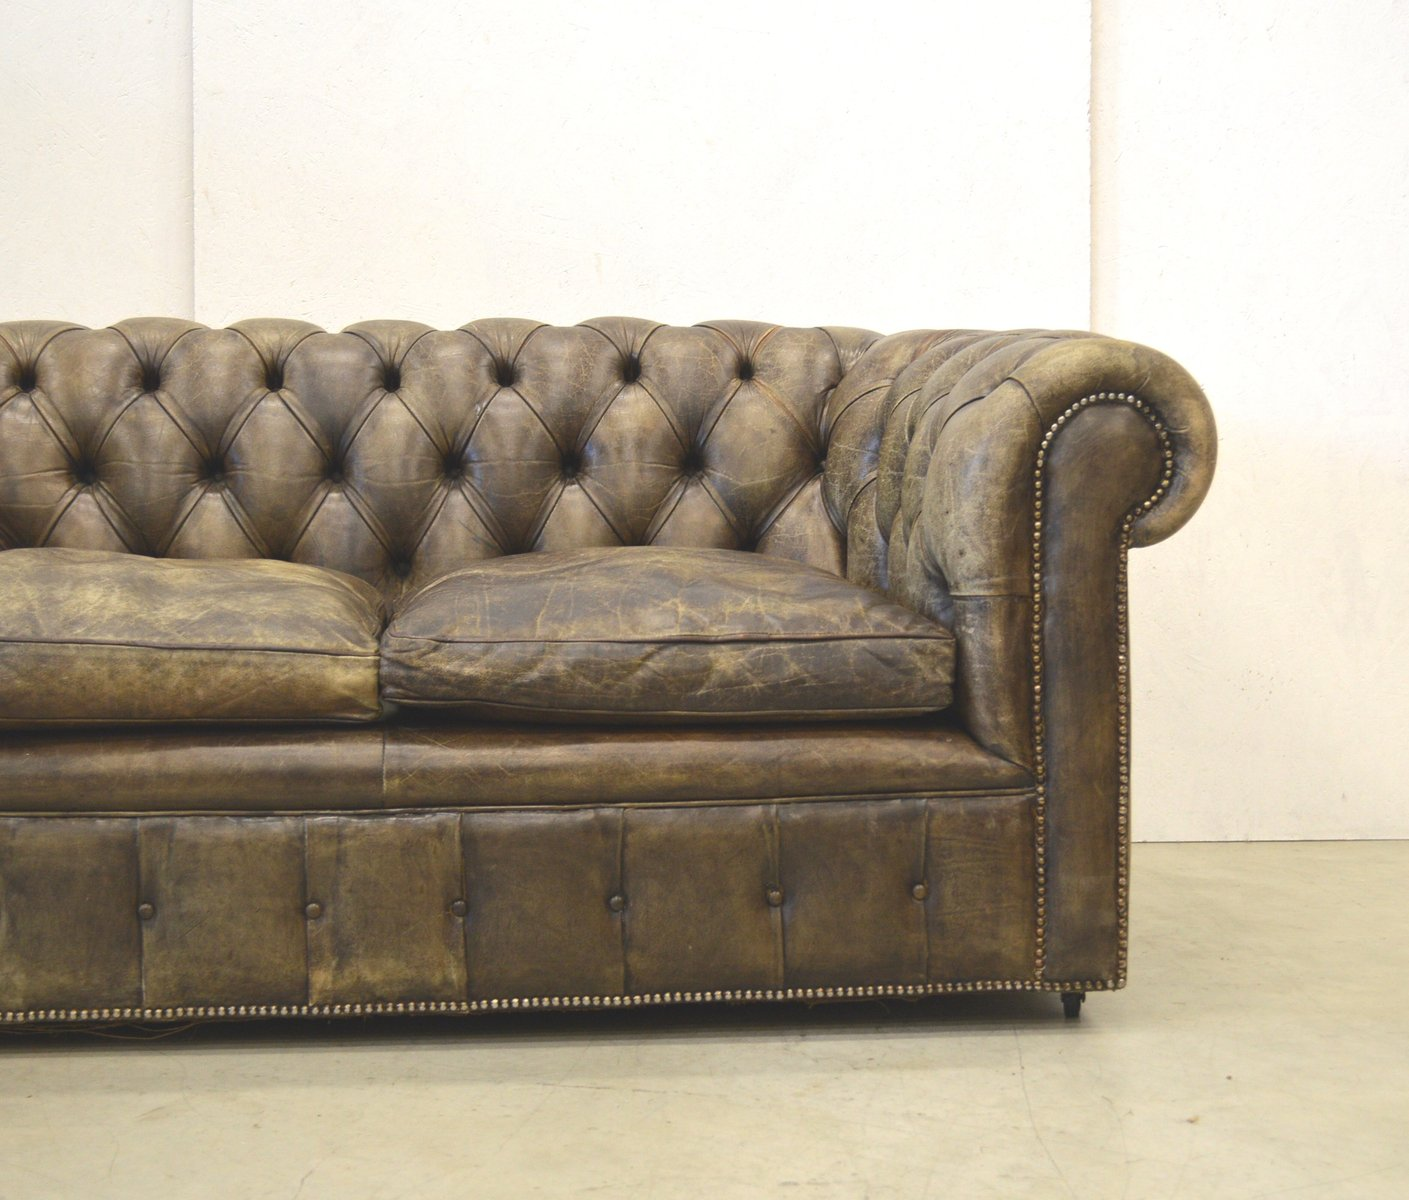 englisches vintage chesterfield zwei sitzer ledersofa in. Black Bedroom Furniture Sets. Home Design Ideas